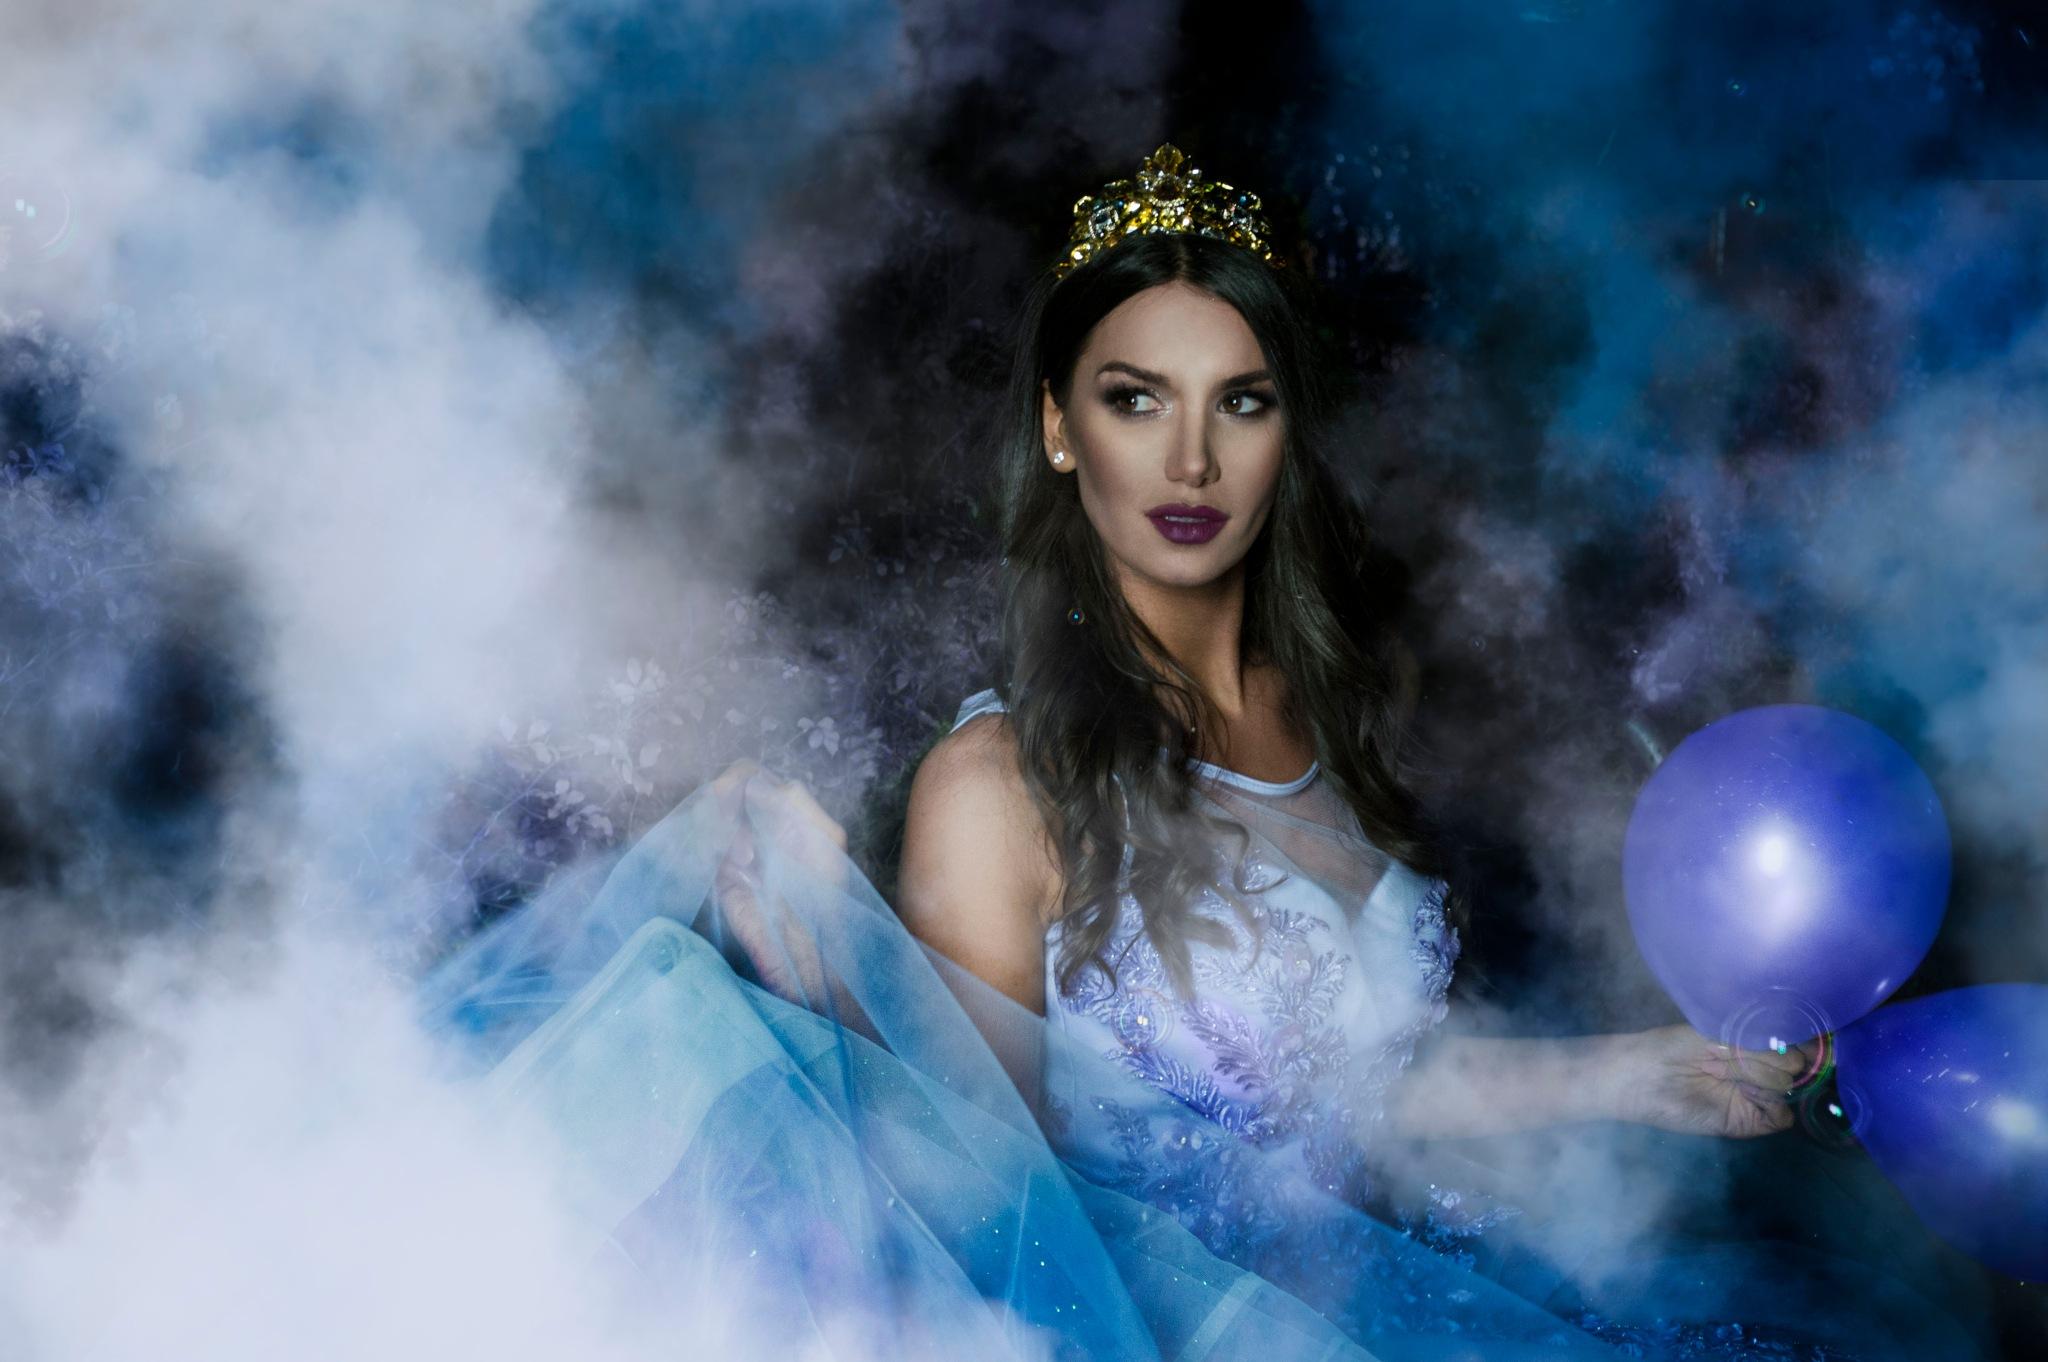 Blue dreams, pt.2 by Lena Aberdar